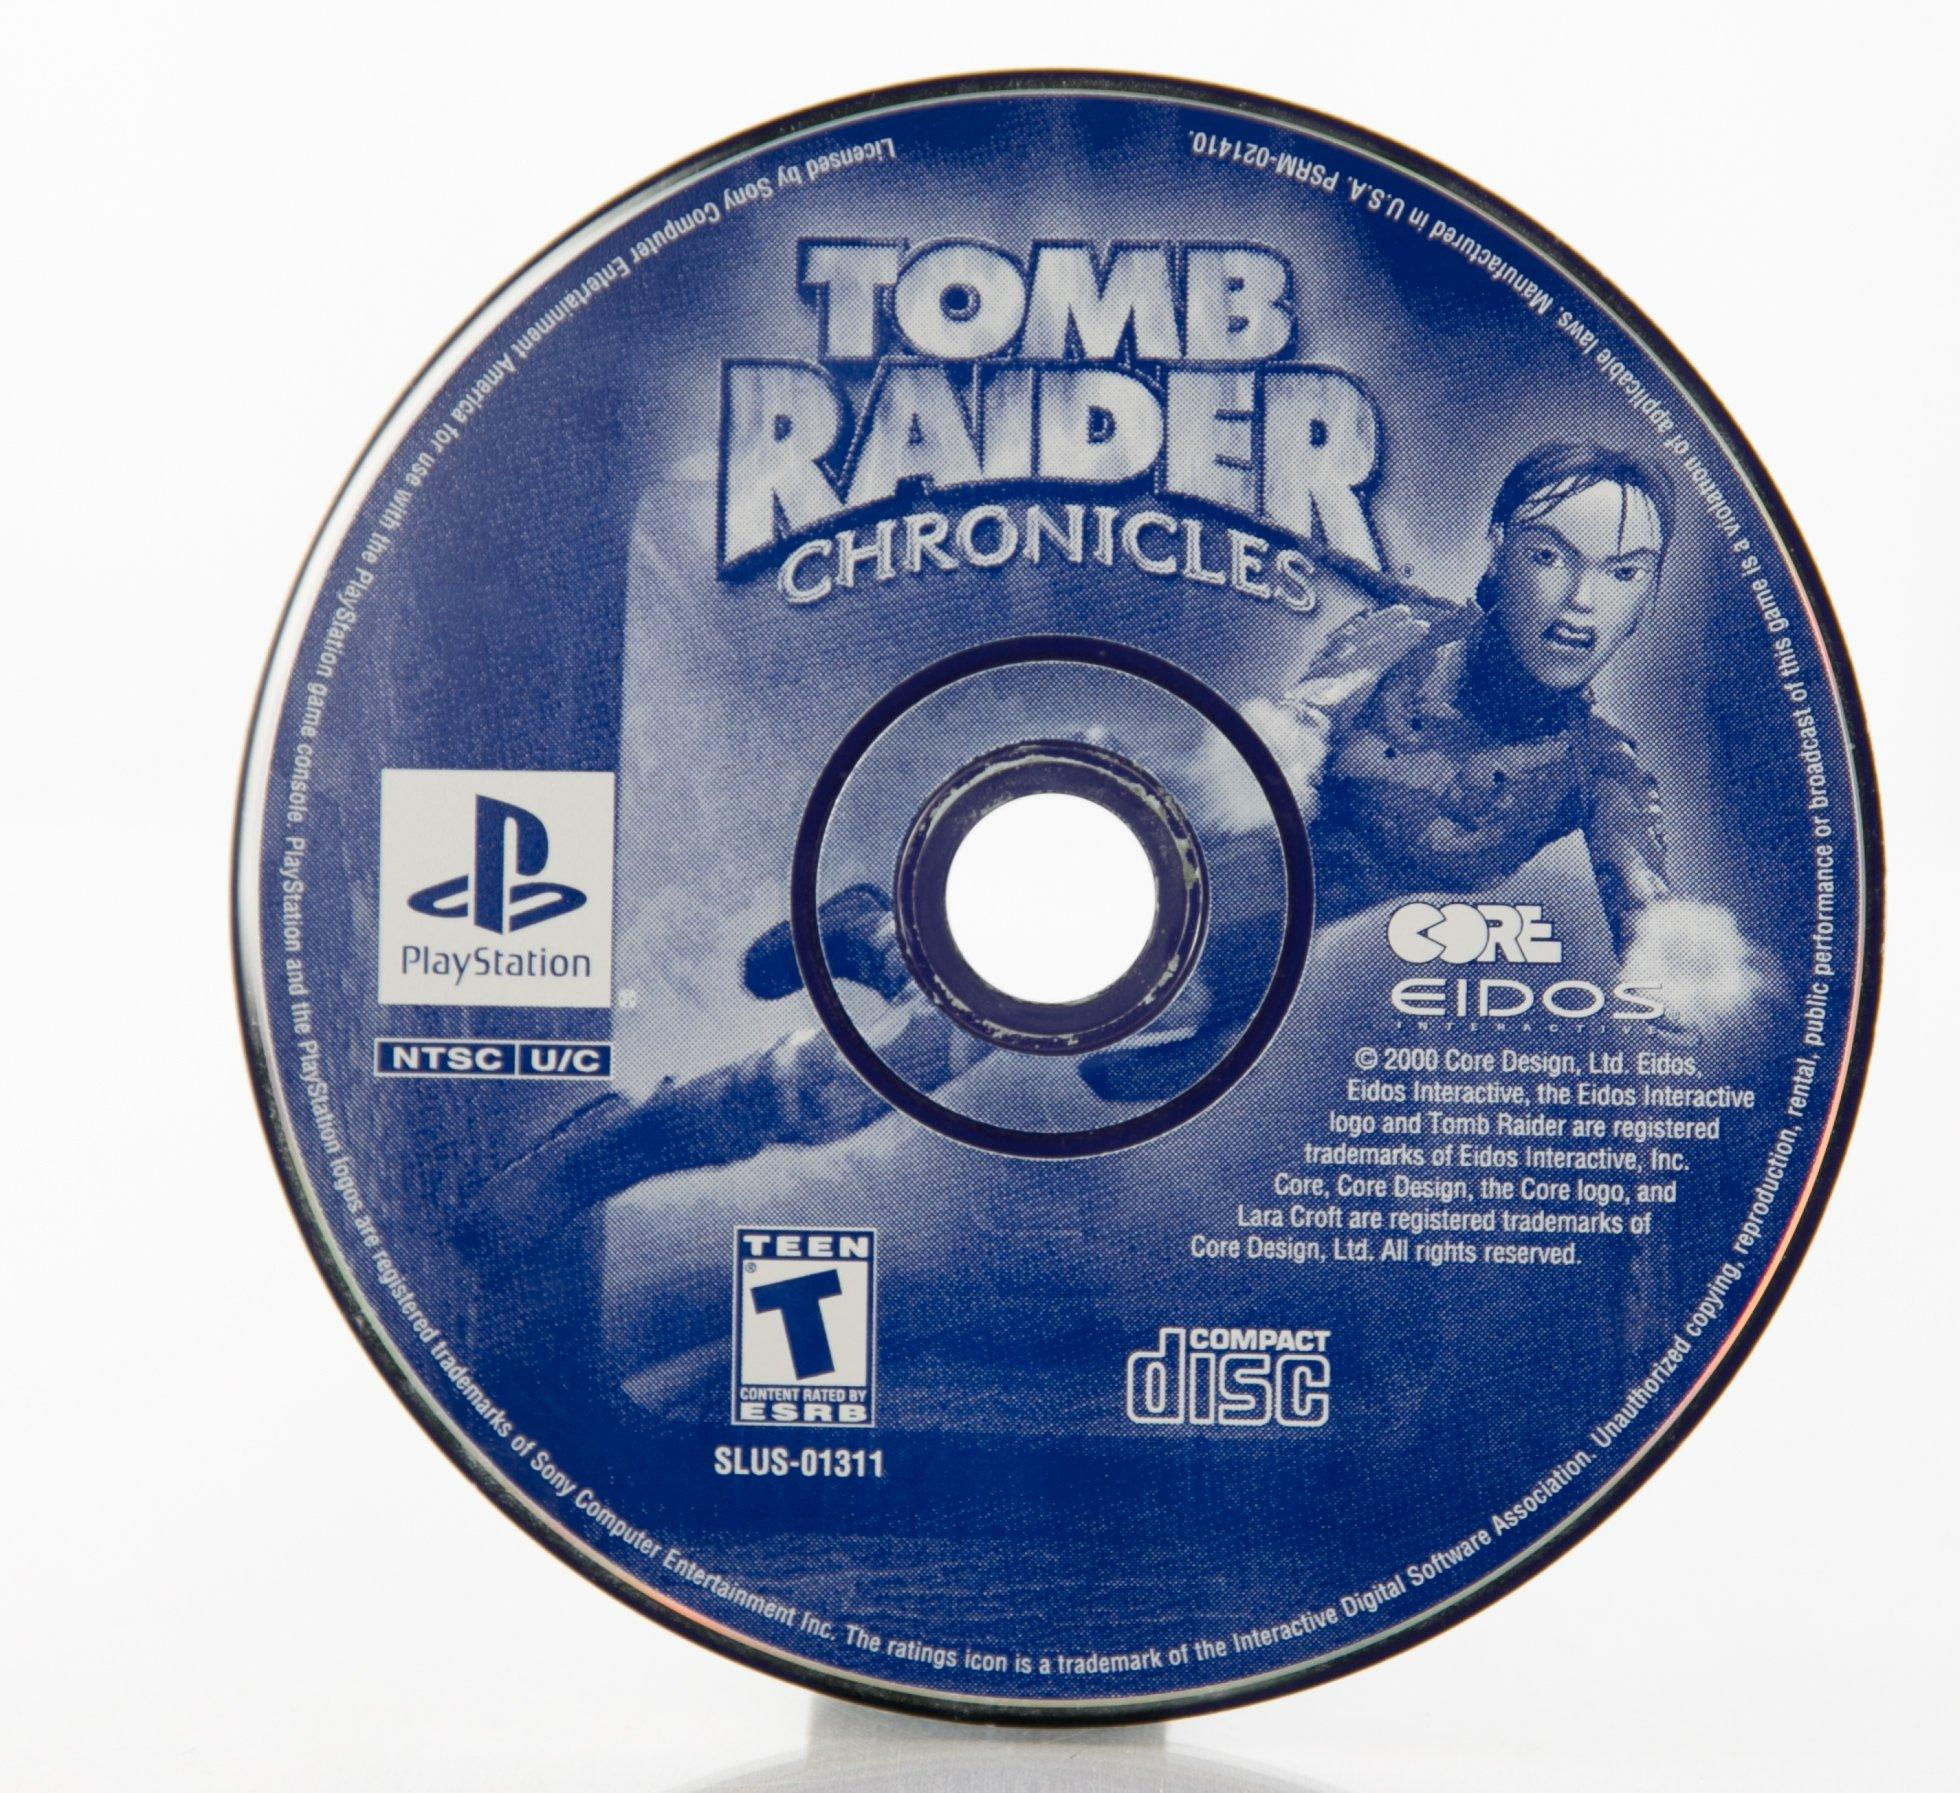 Tomb Raider Chronicles Playstation Gamestop